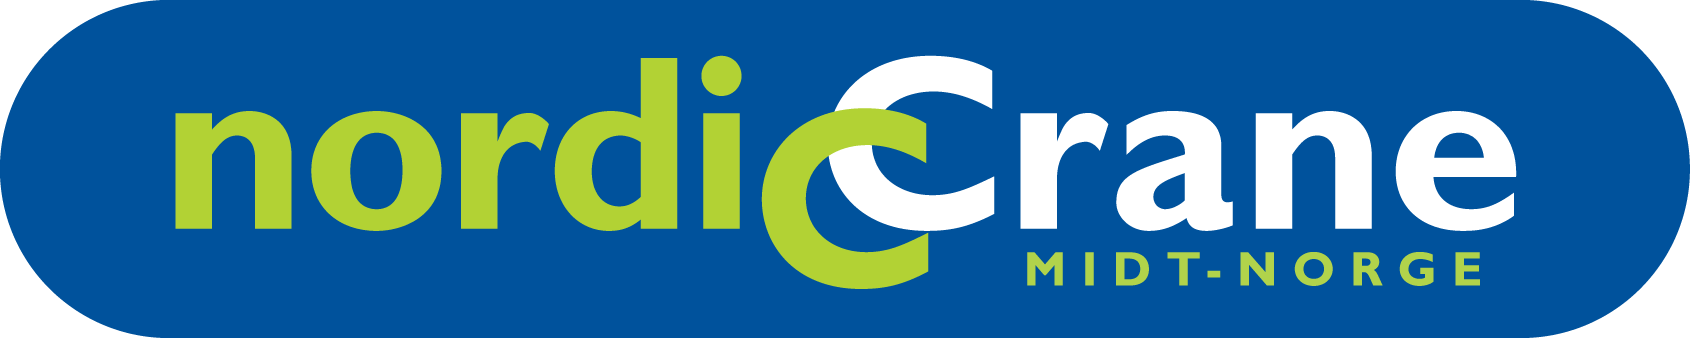 NordicCrane Midt-Norge logo